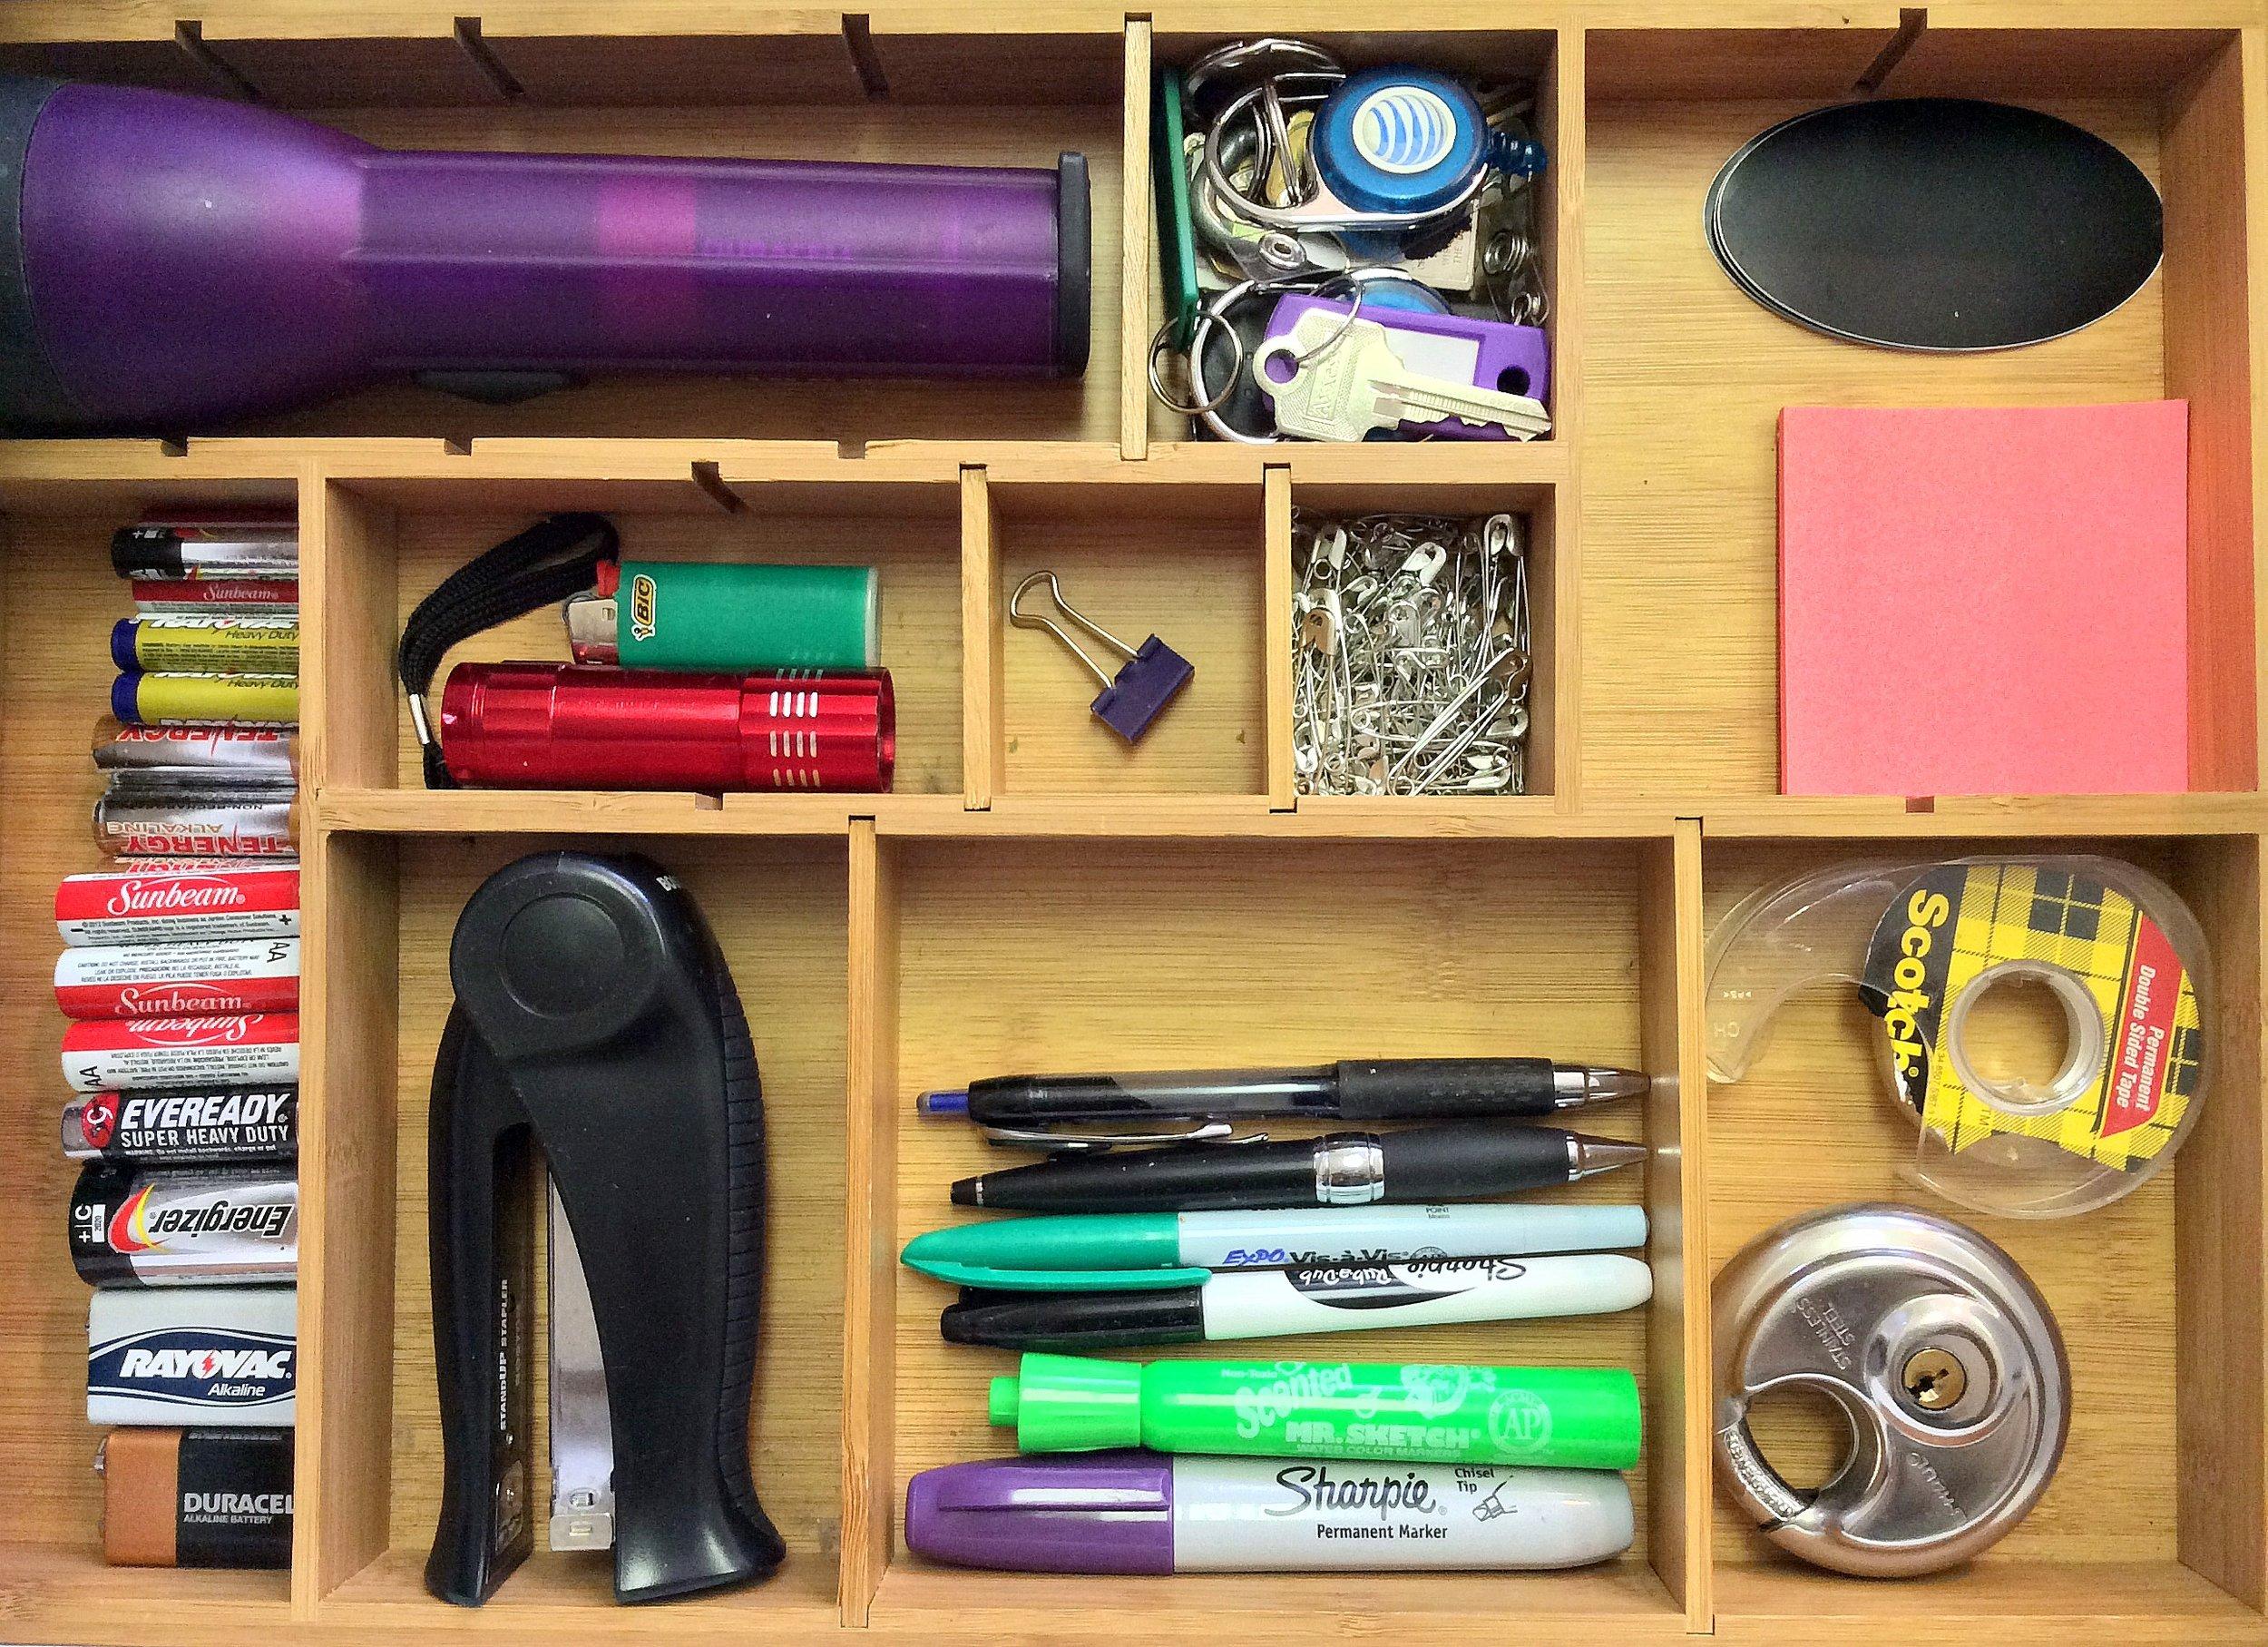 junk-drawer-after4.jpg